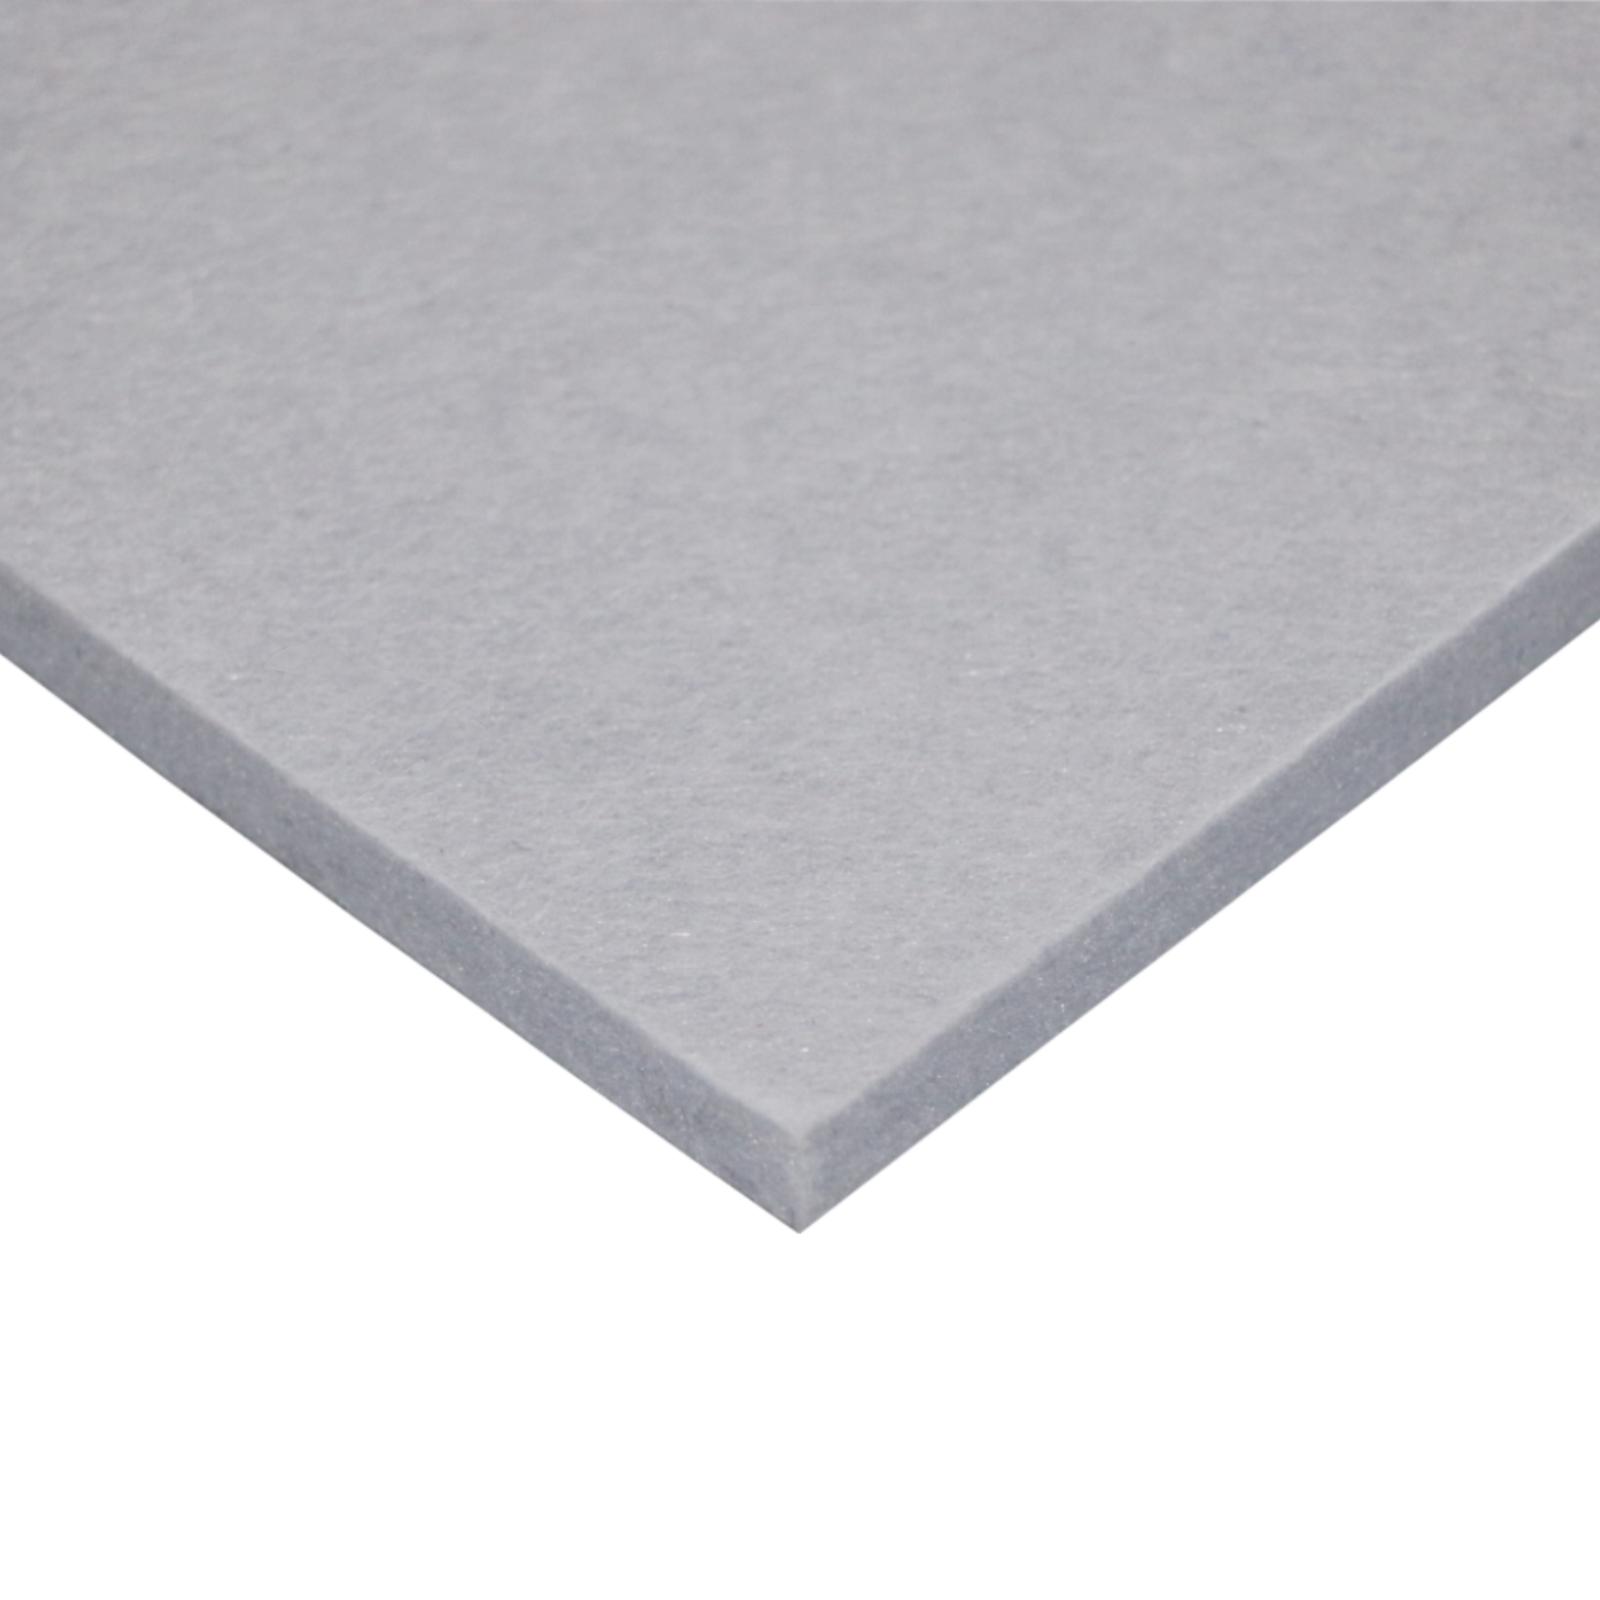 ForestOne 2420 x 1220mm x 9mm Grey Acoustic Pinboard